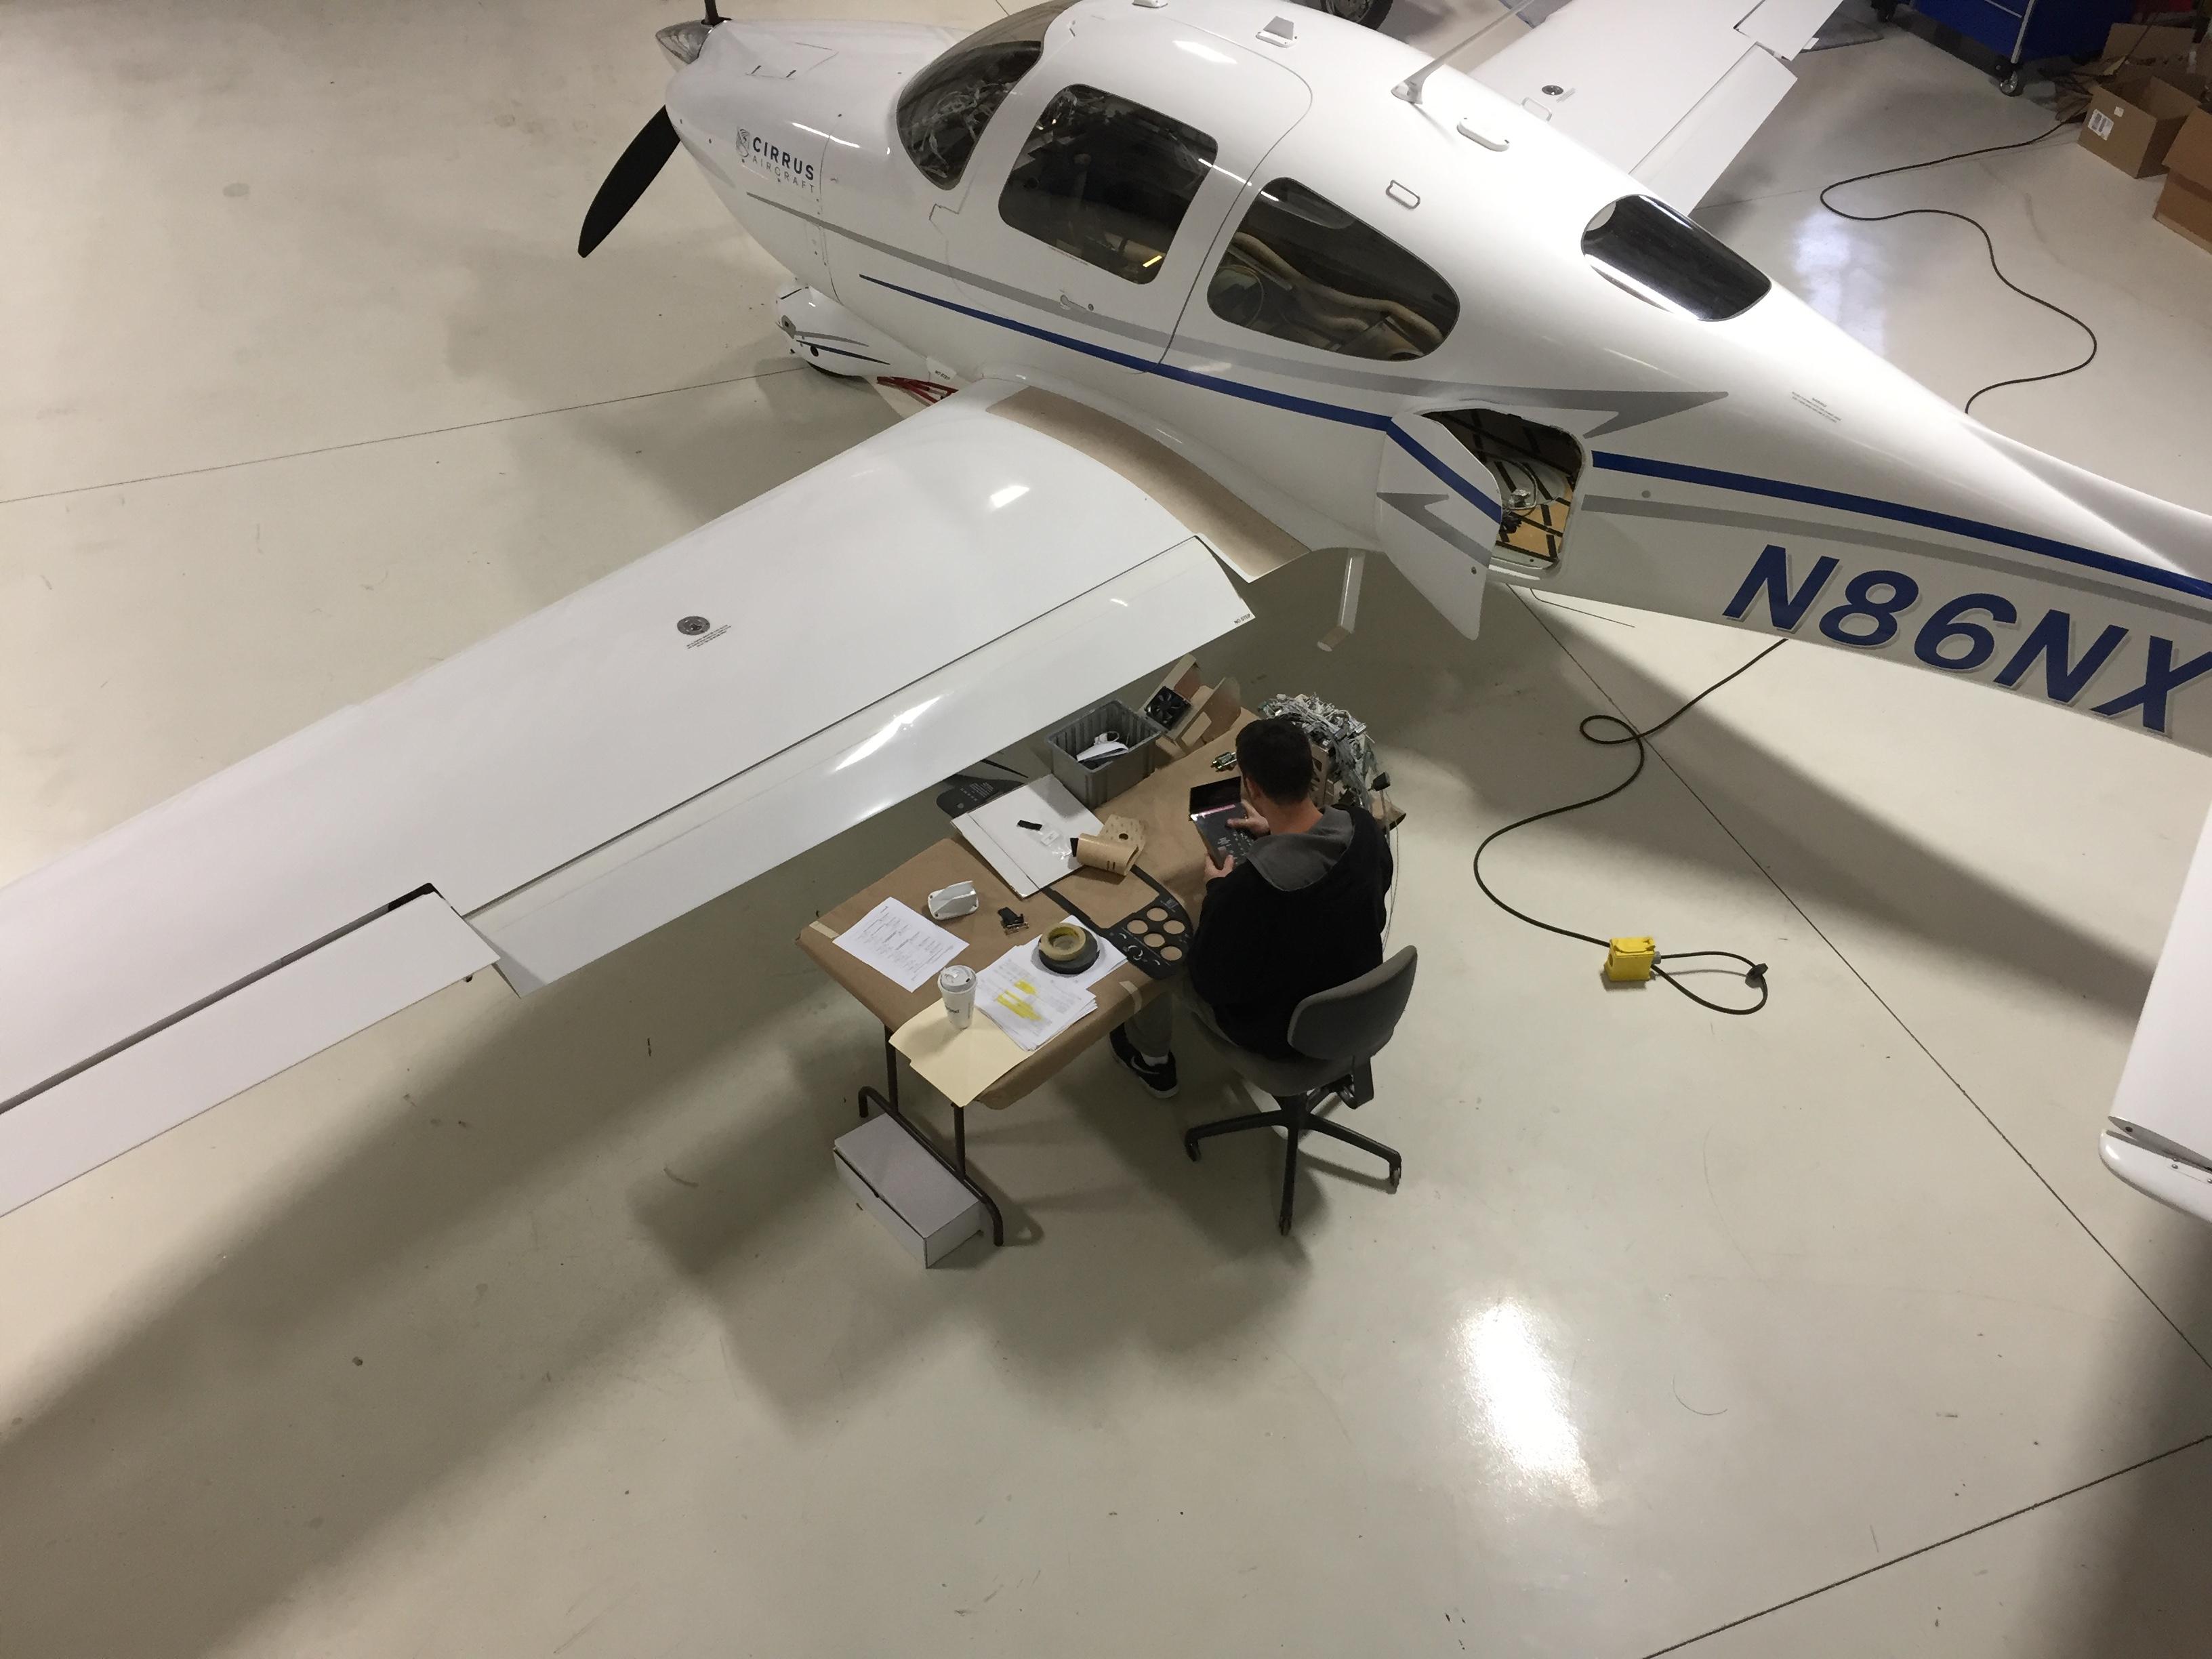 N86NX NexAir's Gold Spinner-to-Tail Restoration - NexAir